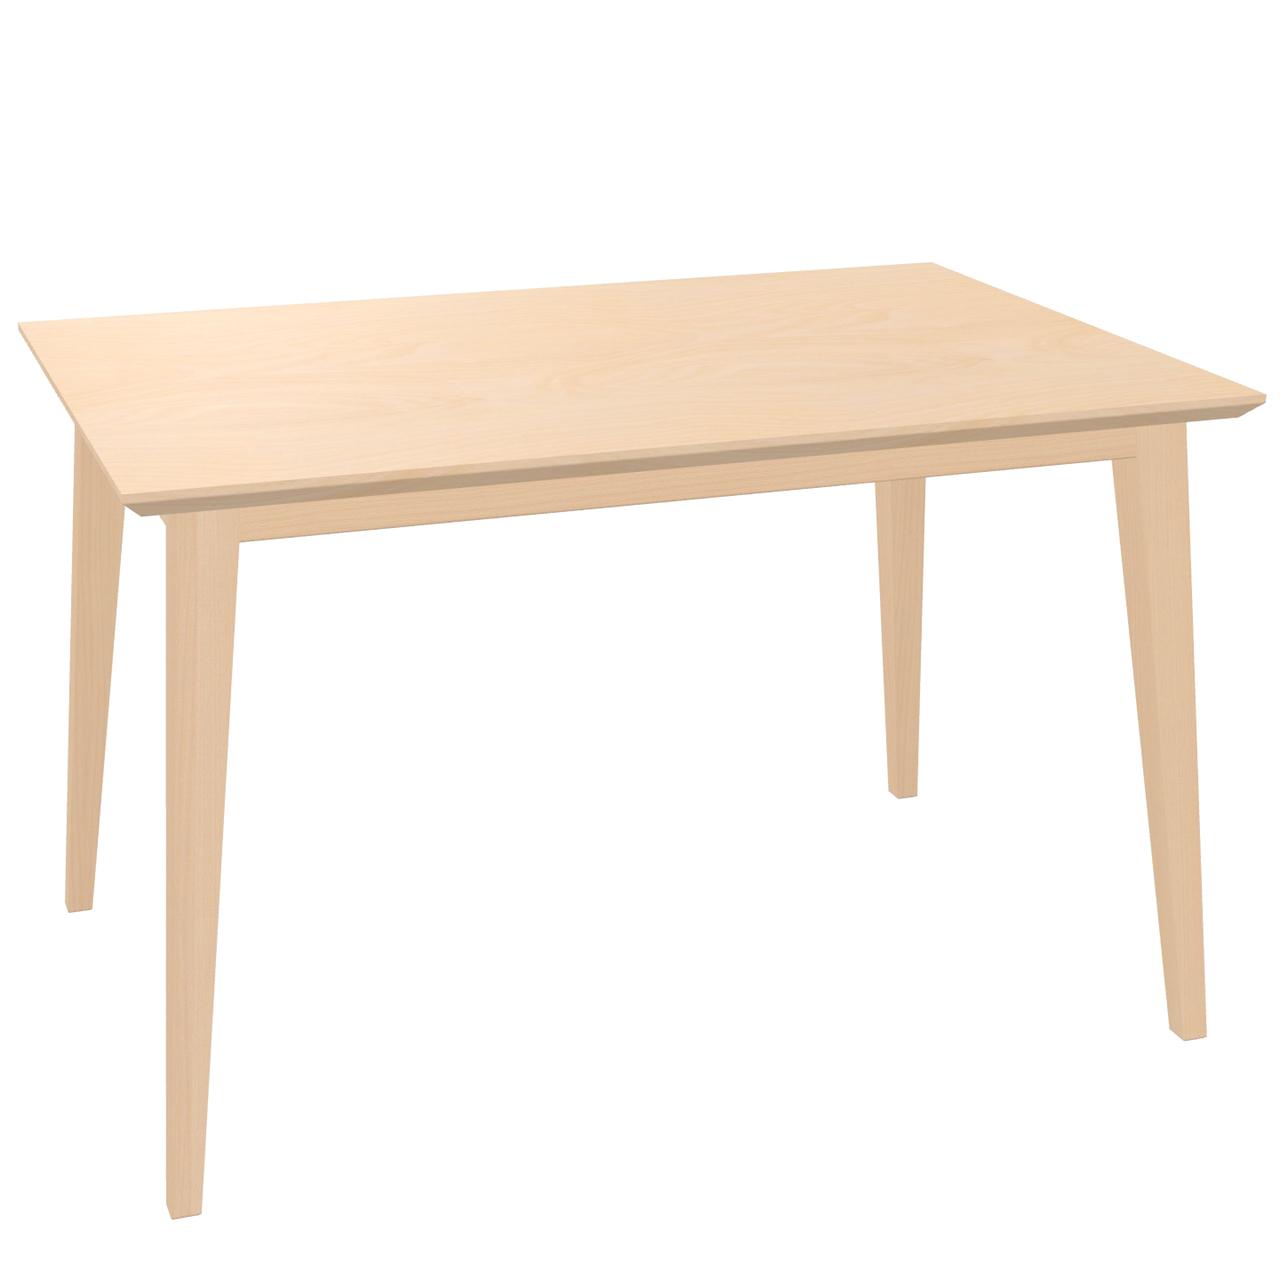 Ton Ausziehbarer Tisch 'Jylland' 90 x 140 - 200 cm, Buche, Natur lackiert